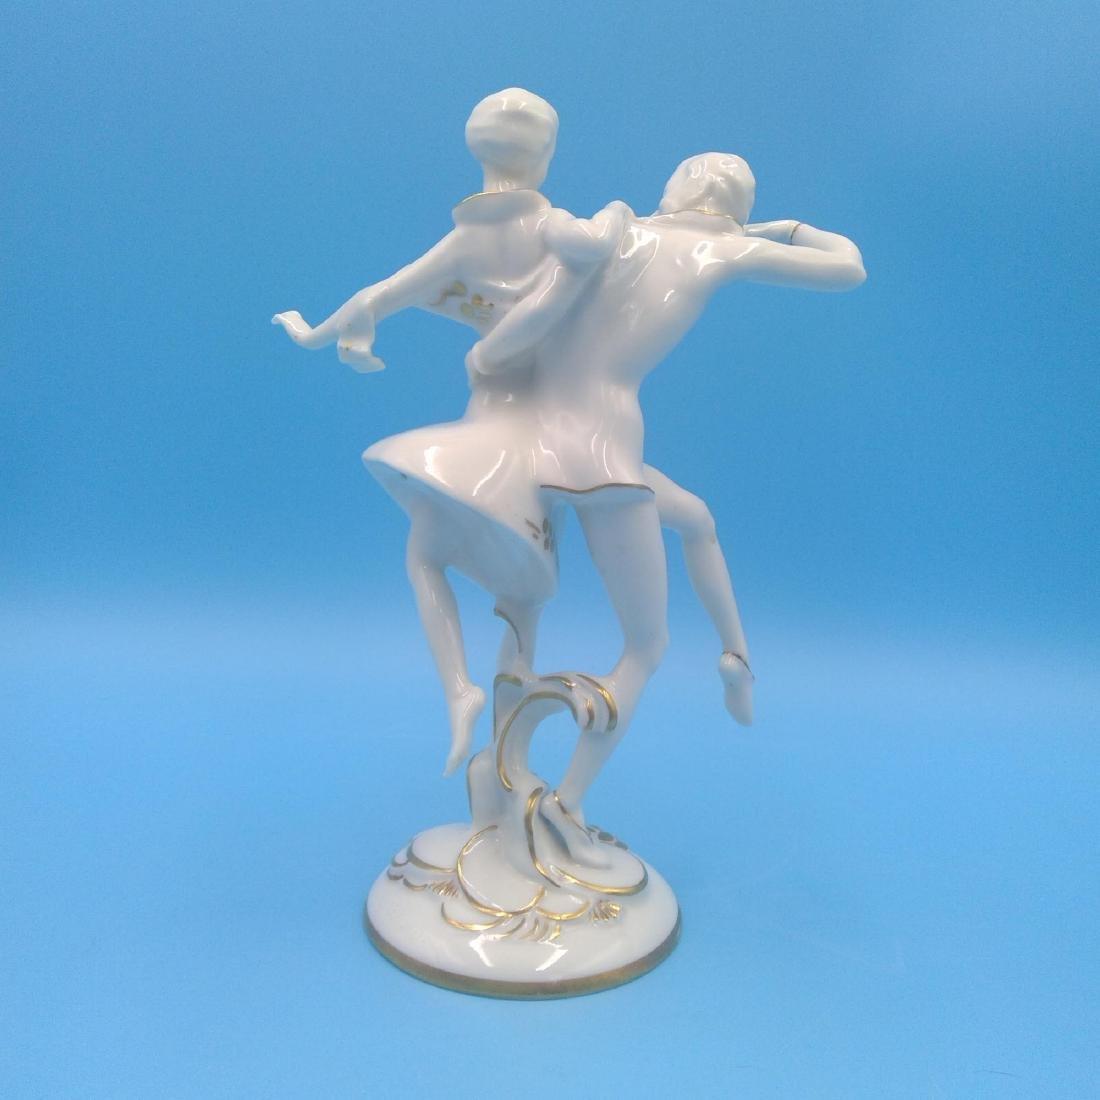 HUTSCHENREUTHER GERMAN PORCELAIN FIGURINE DANCERS - 3